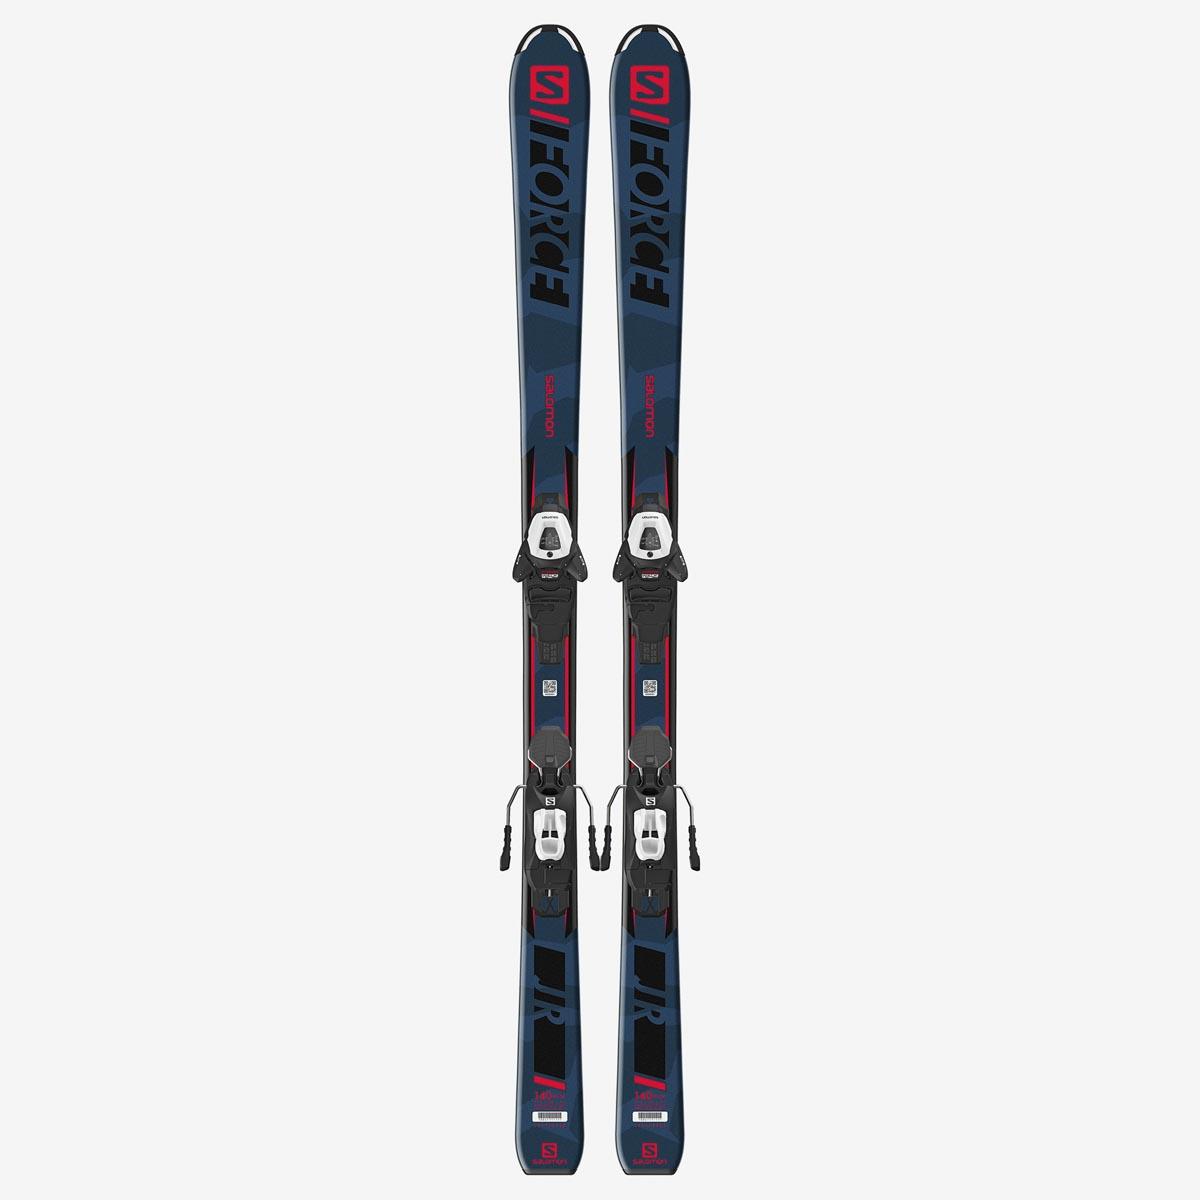 Комплект: лыжи + крепления S/FORCE JR M + L6 GW J2